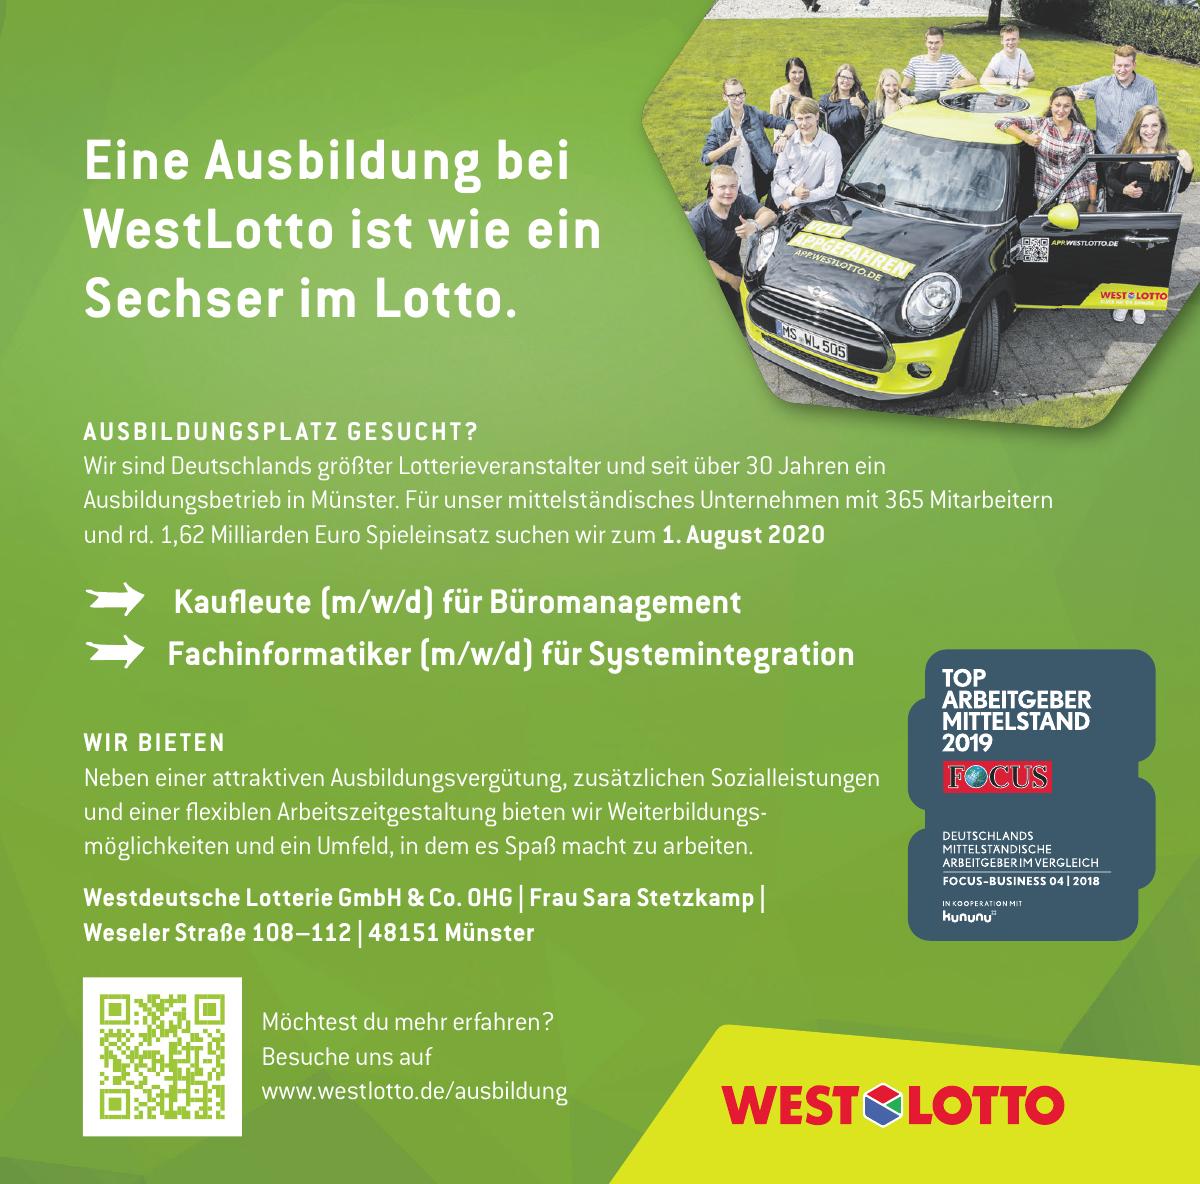 Westdeutsche Lotterie GmbH & Co. OHG